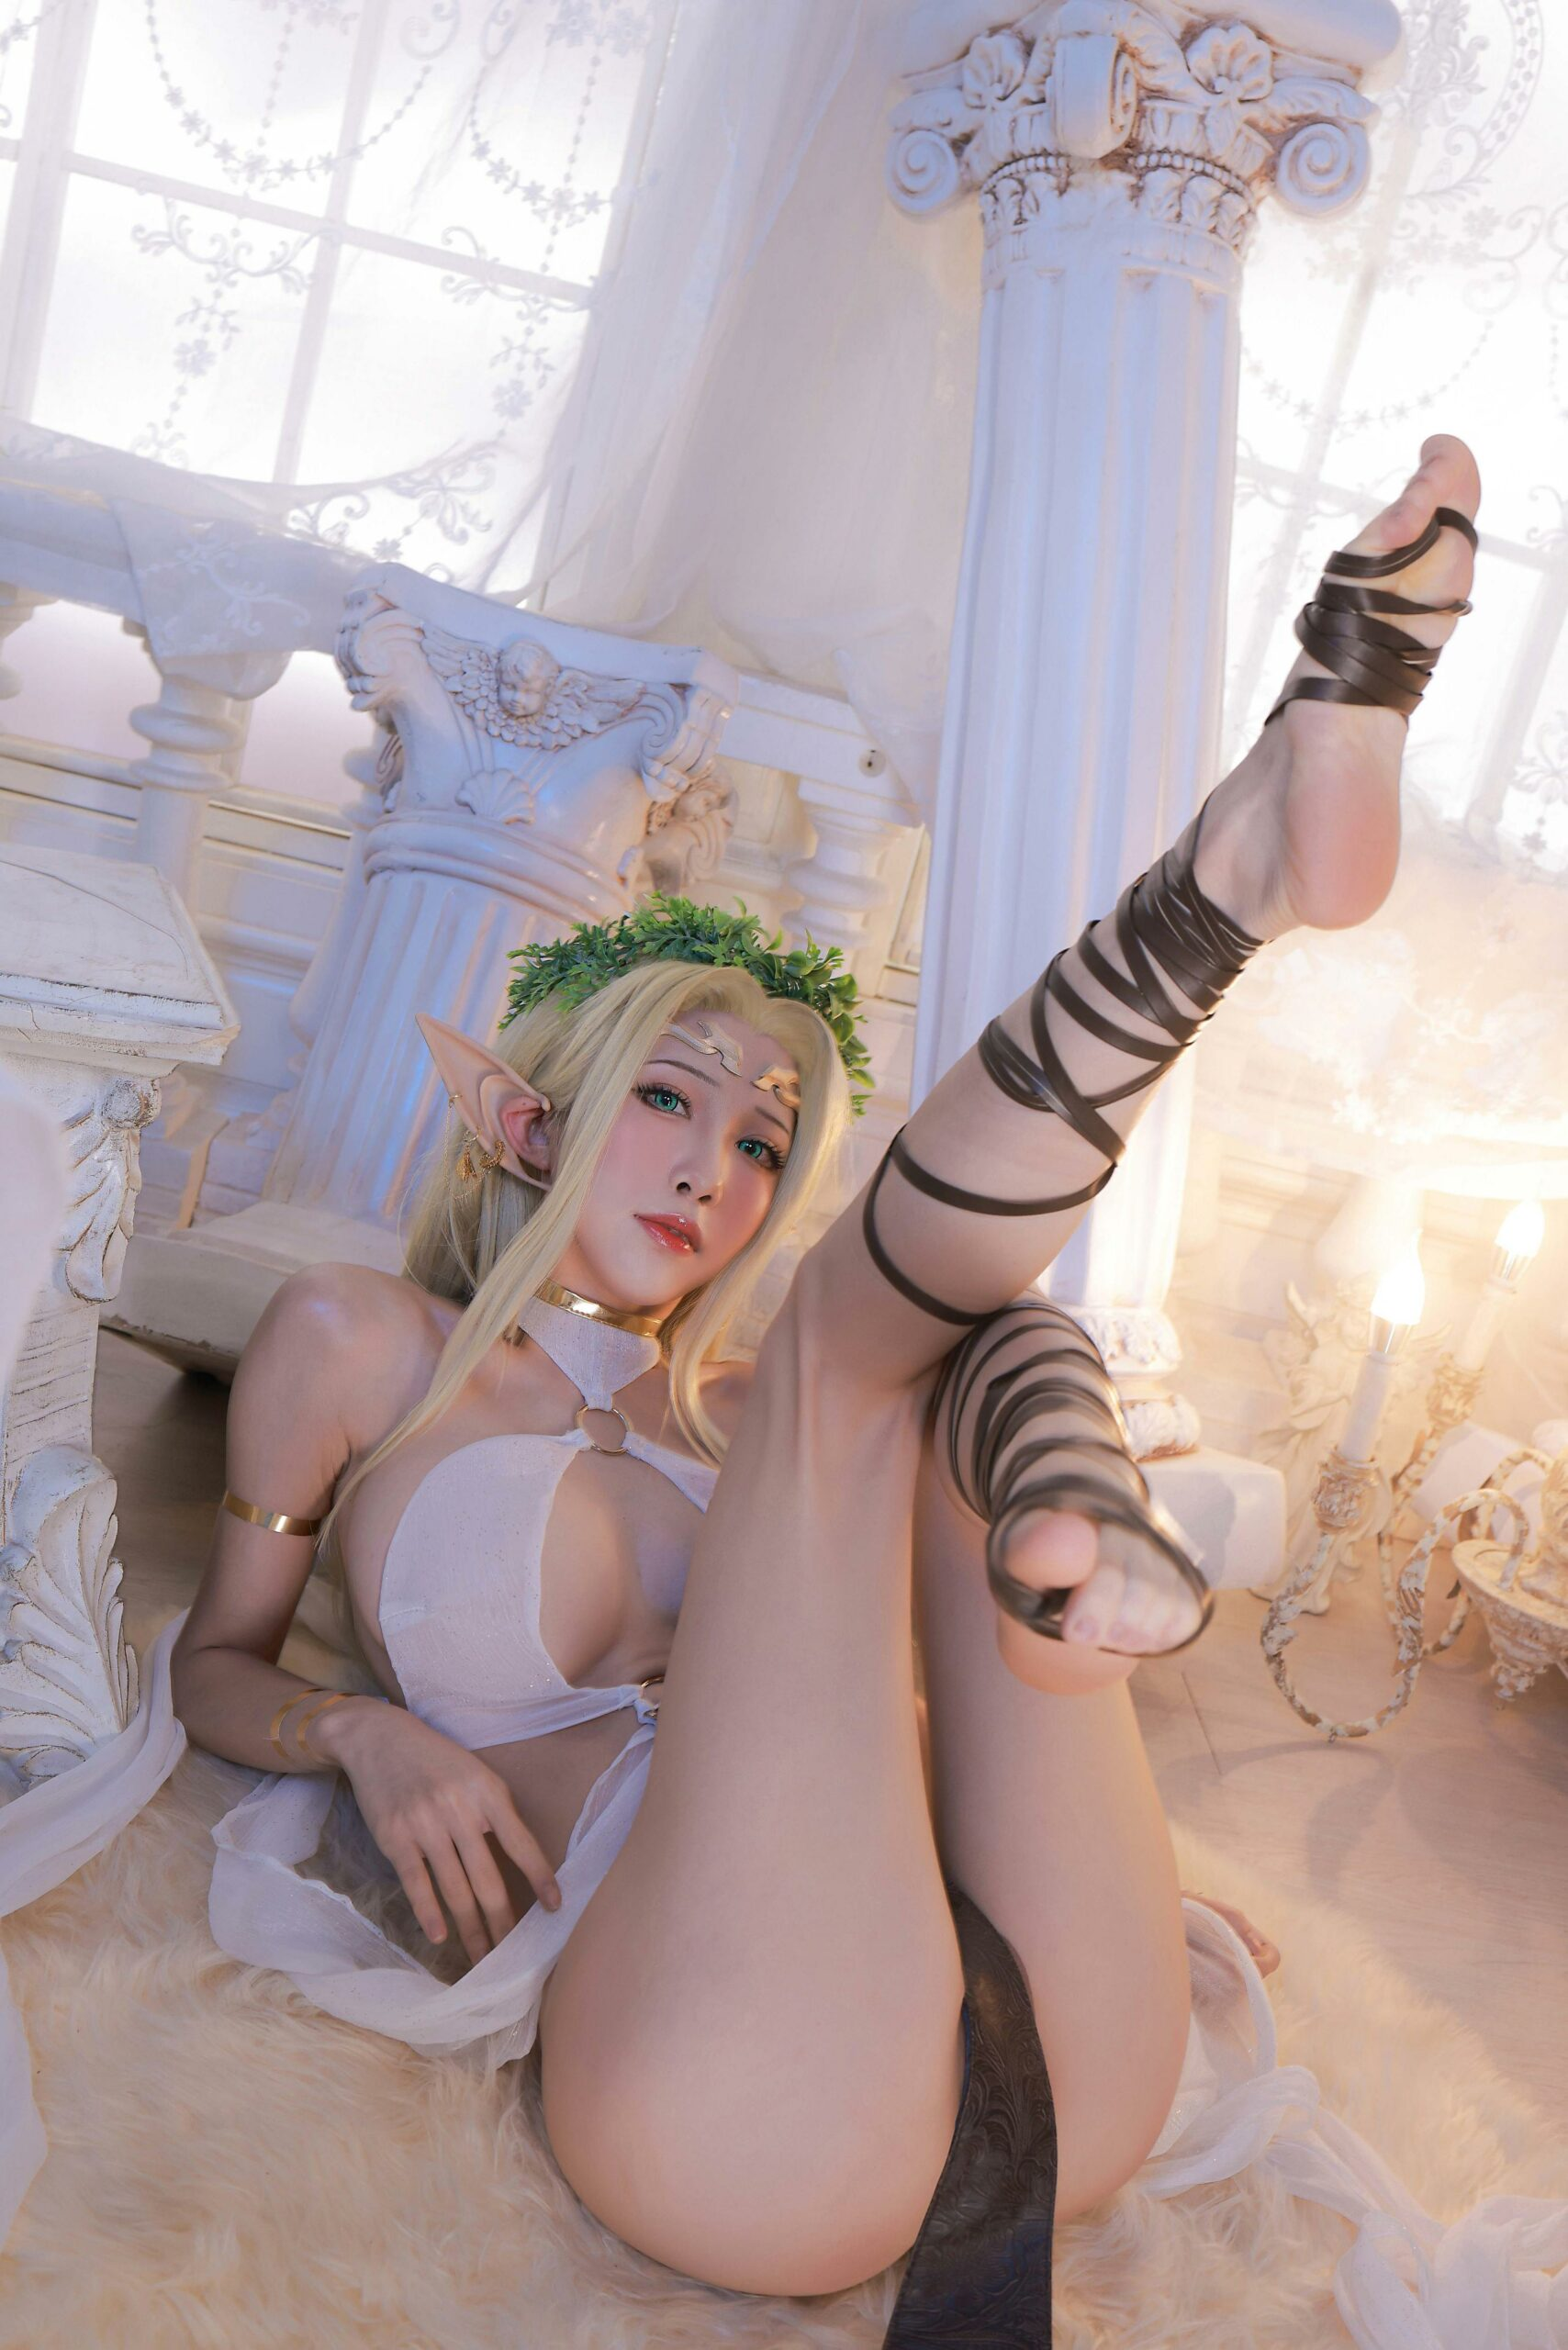 Kuroinu Celestine Cosplay by Aqua 56